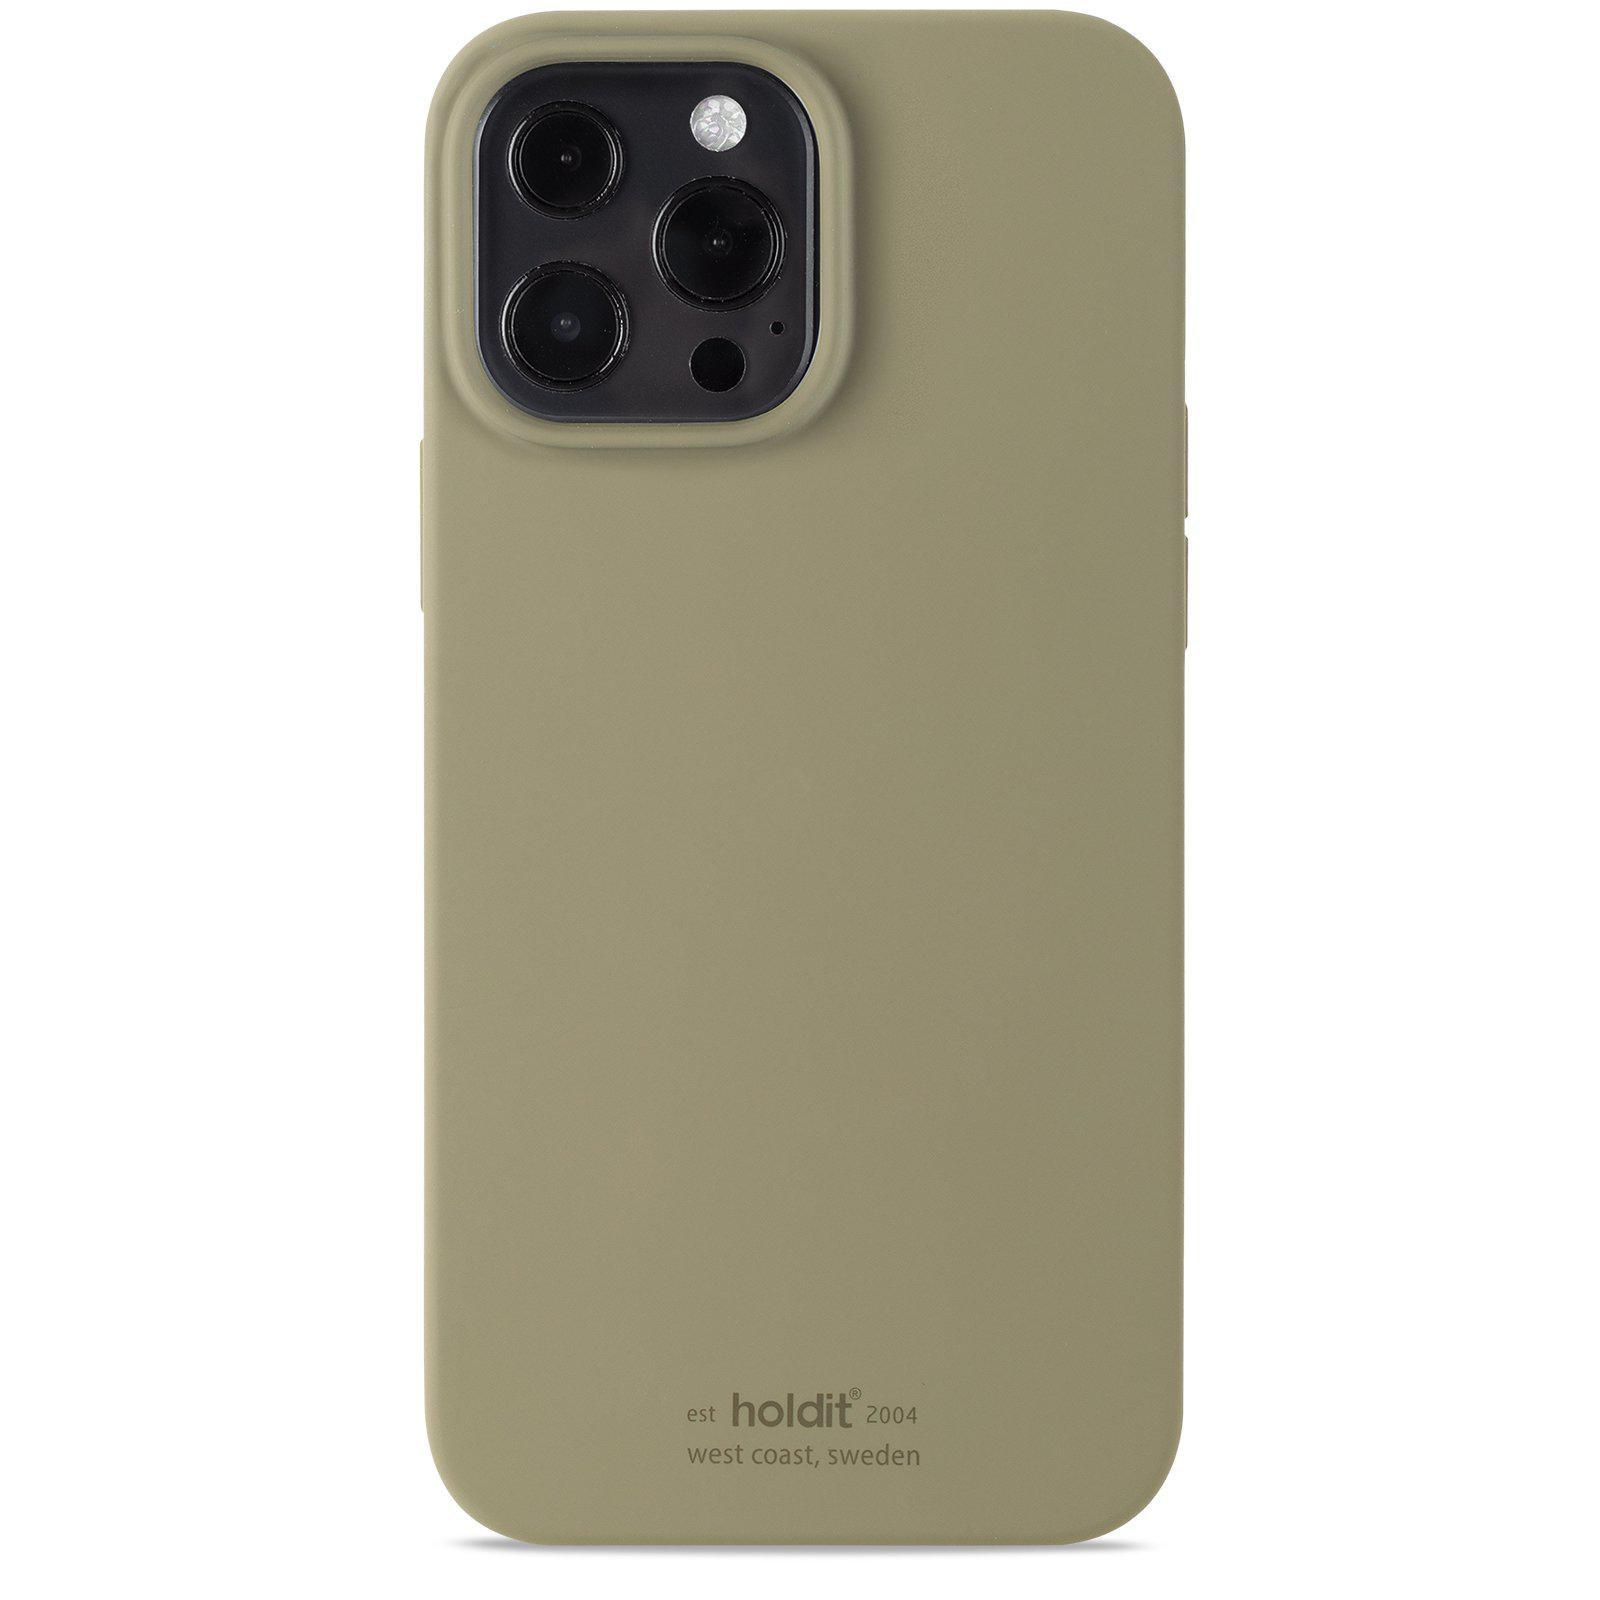 Silikonikuori iPhone 13 Pro Max Khaki Green